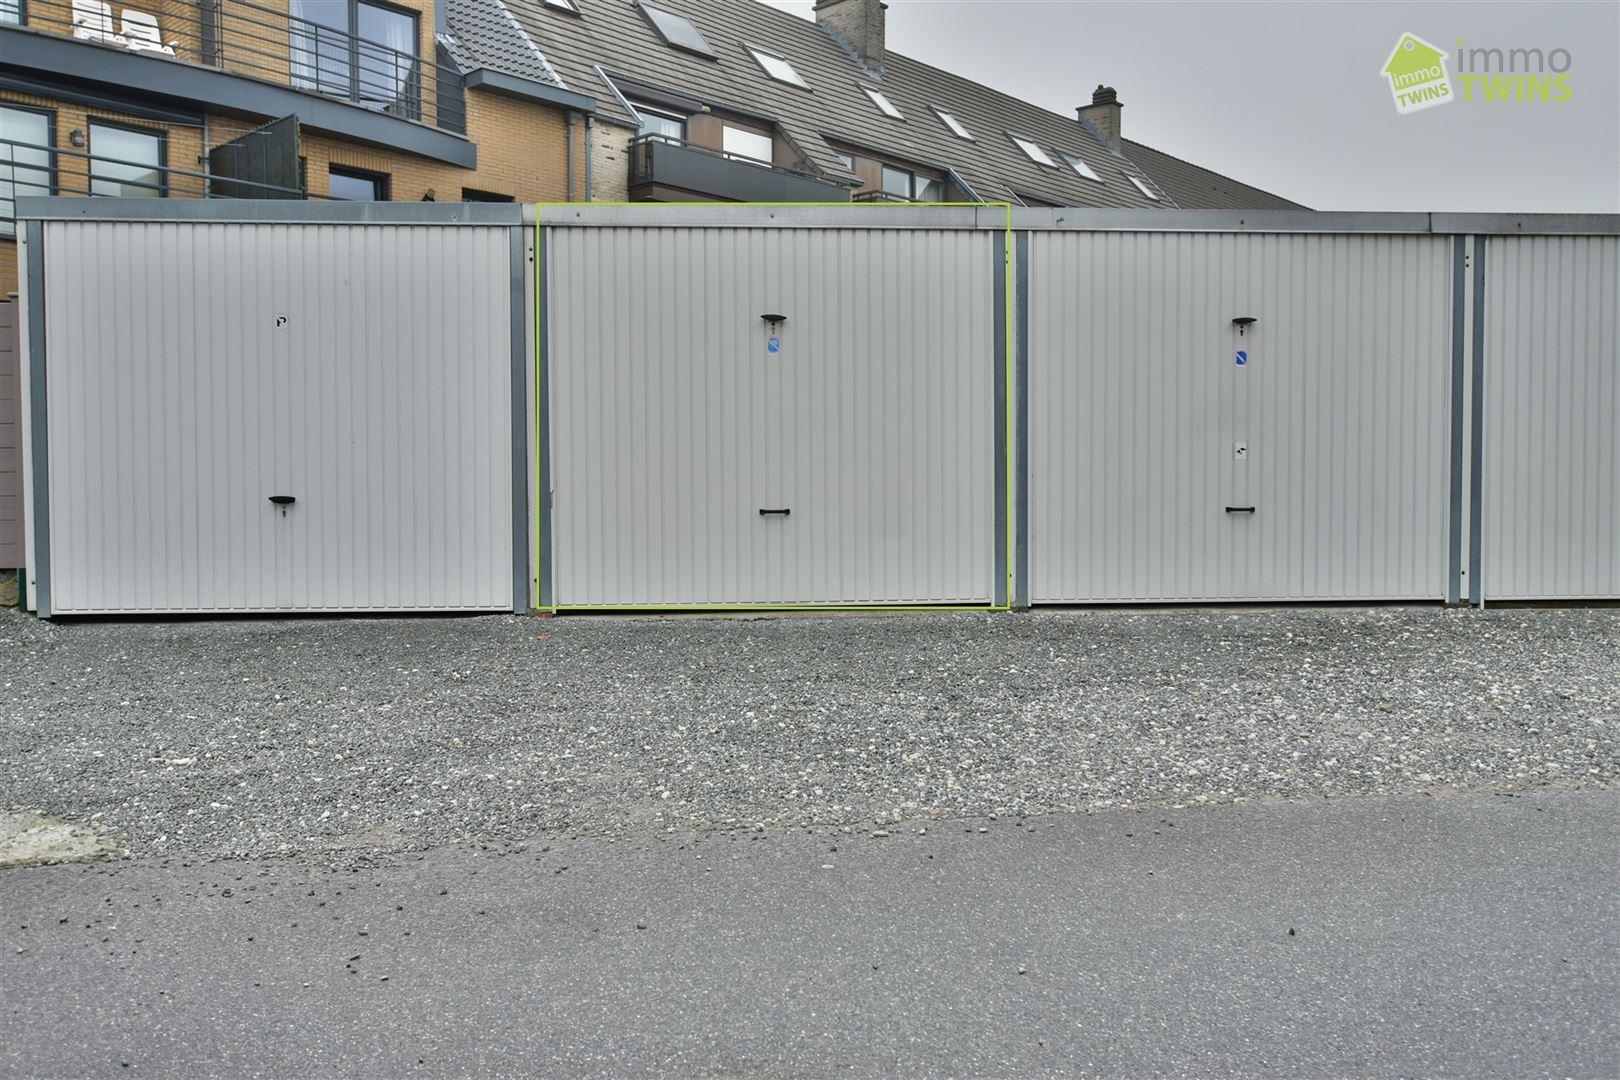 Foto 20 : Appartement te 9200 BAASRODE (België) - Prijs € 650